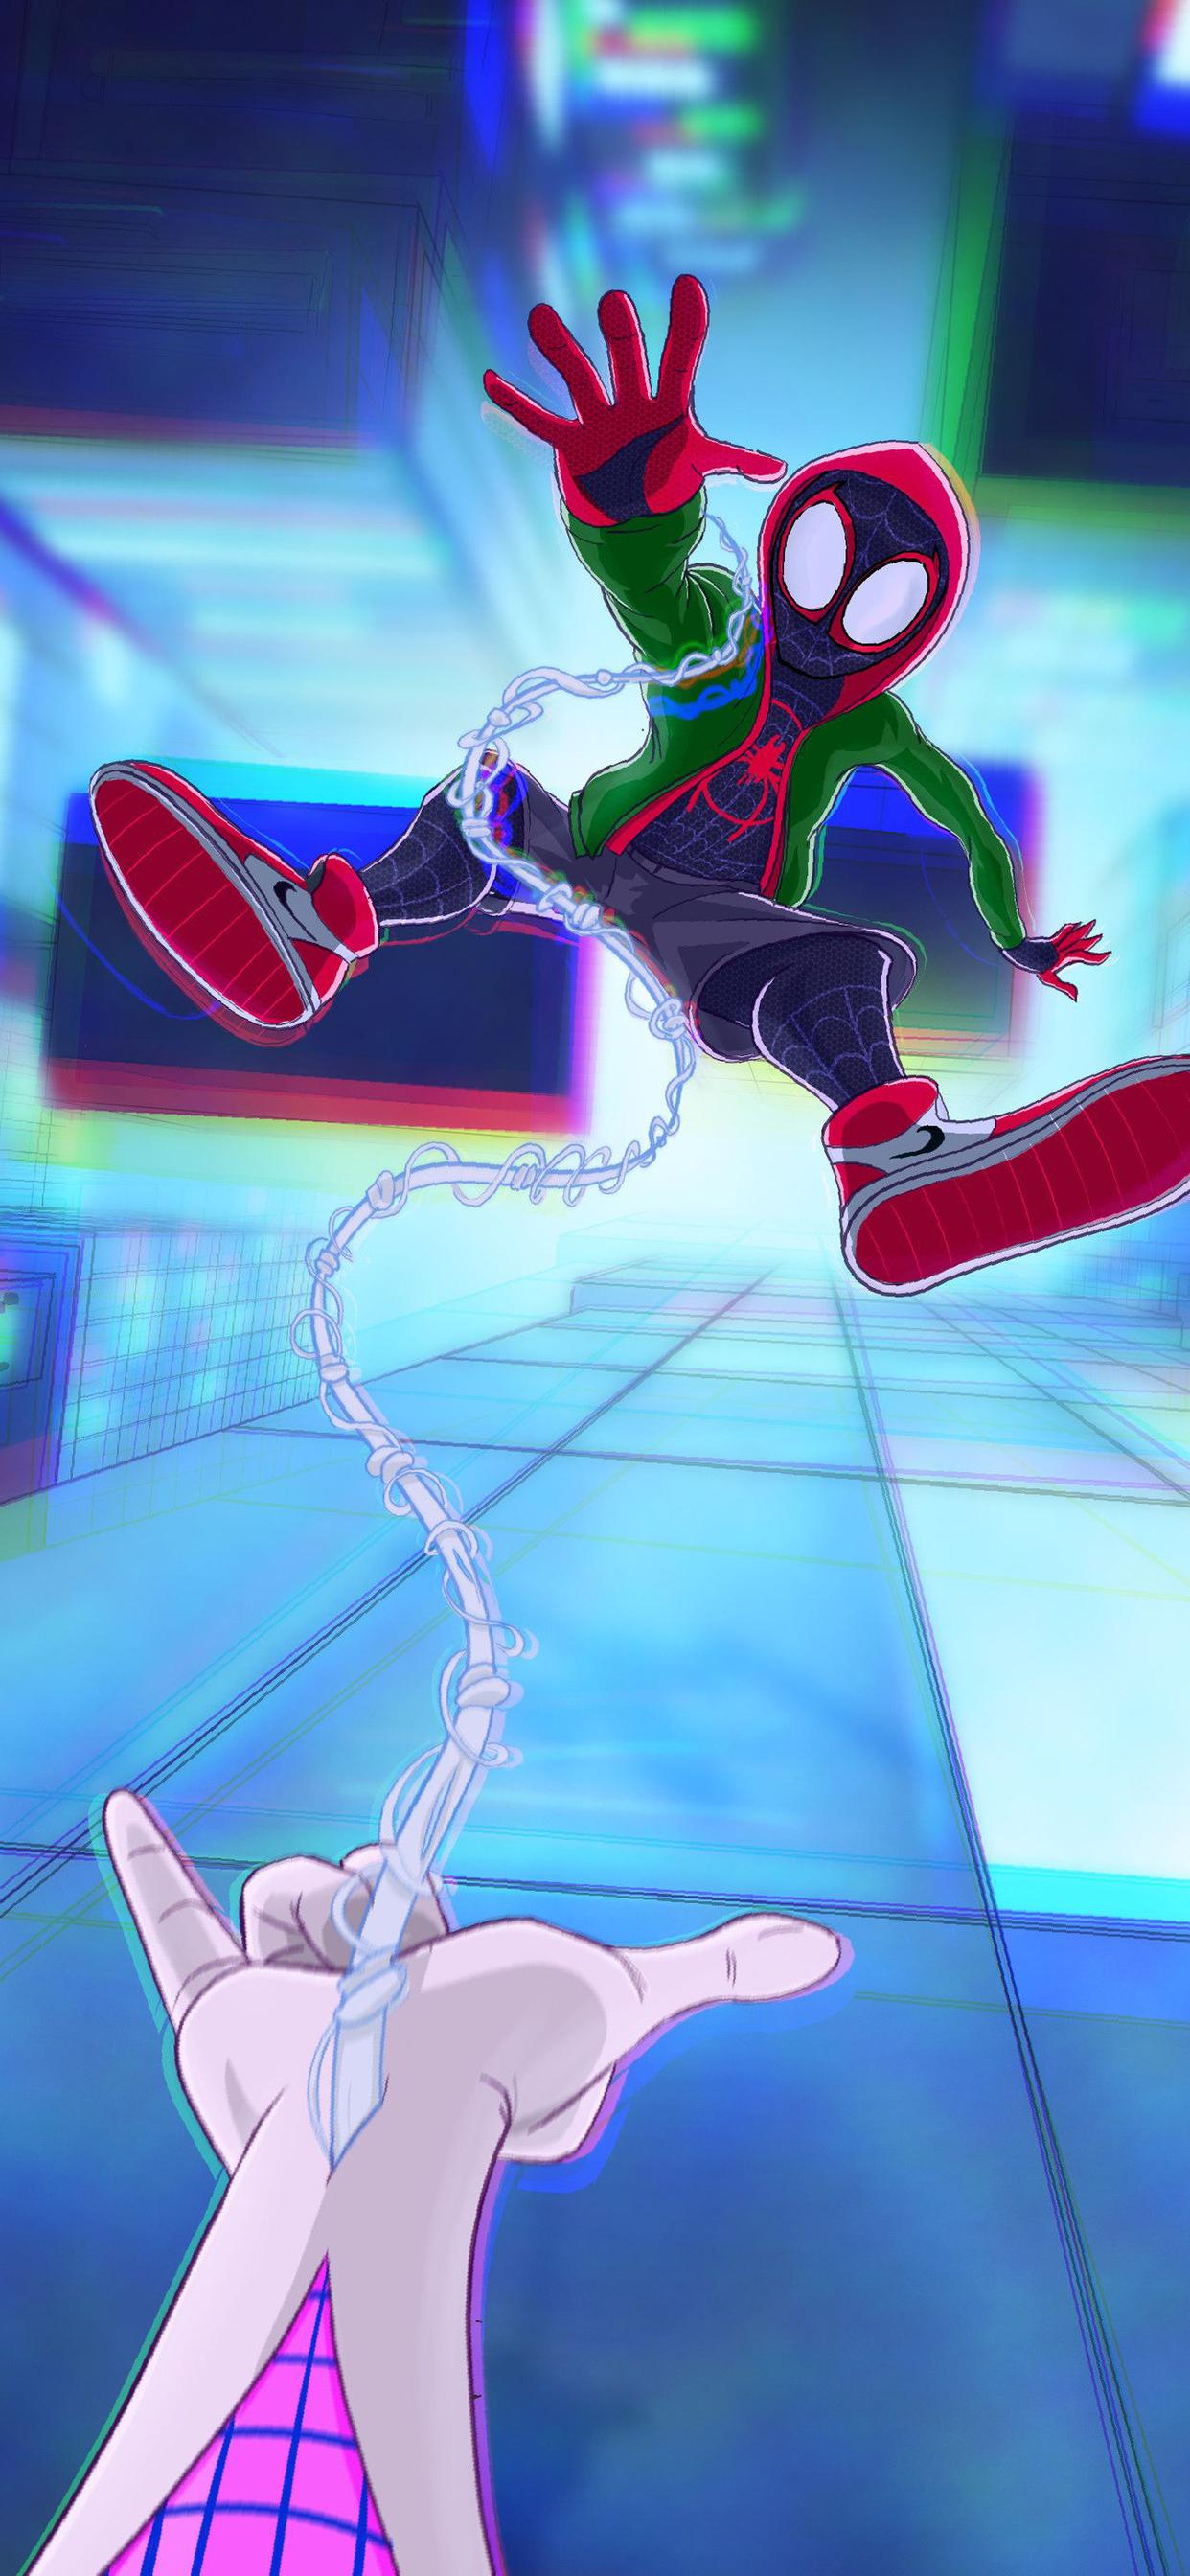 1242x2688 Spiderman Into The Spider Verse Movie Artworks 2018 Iphone